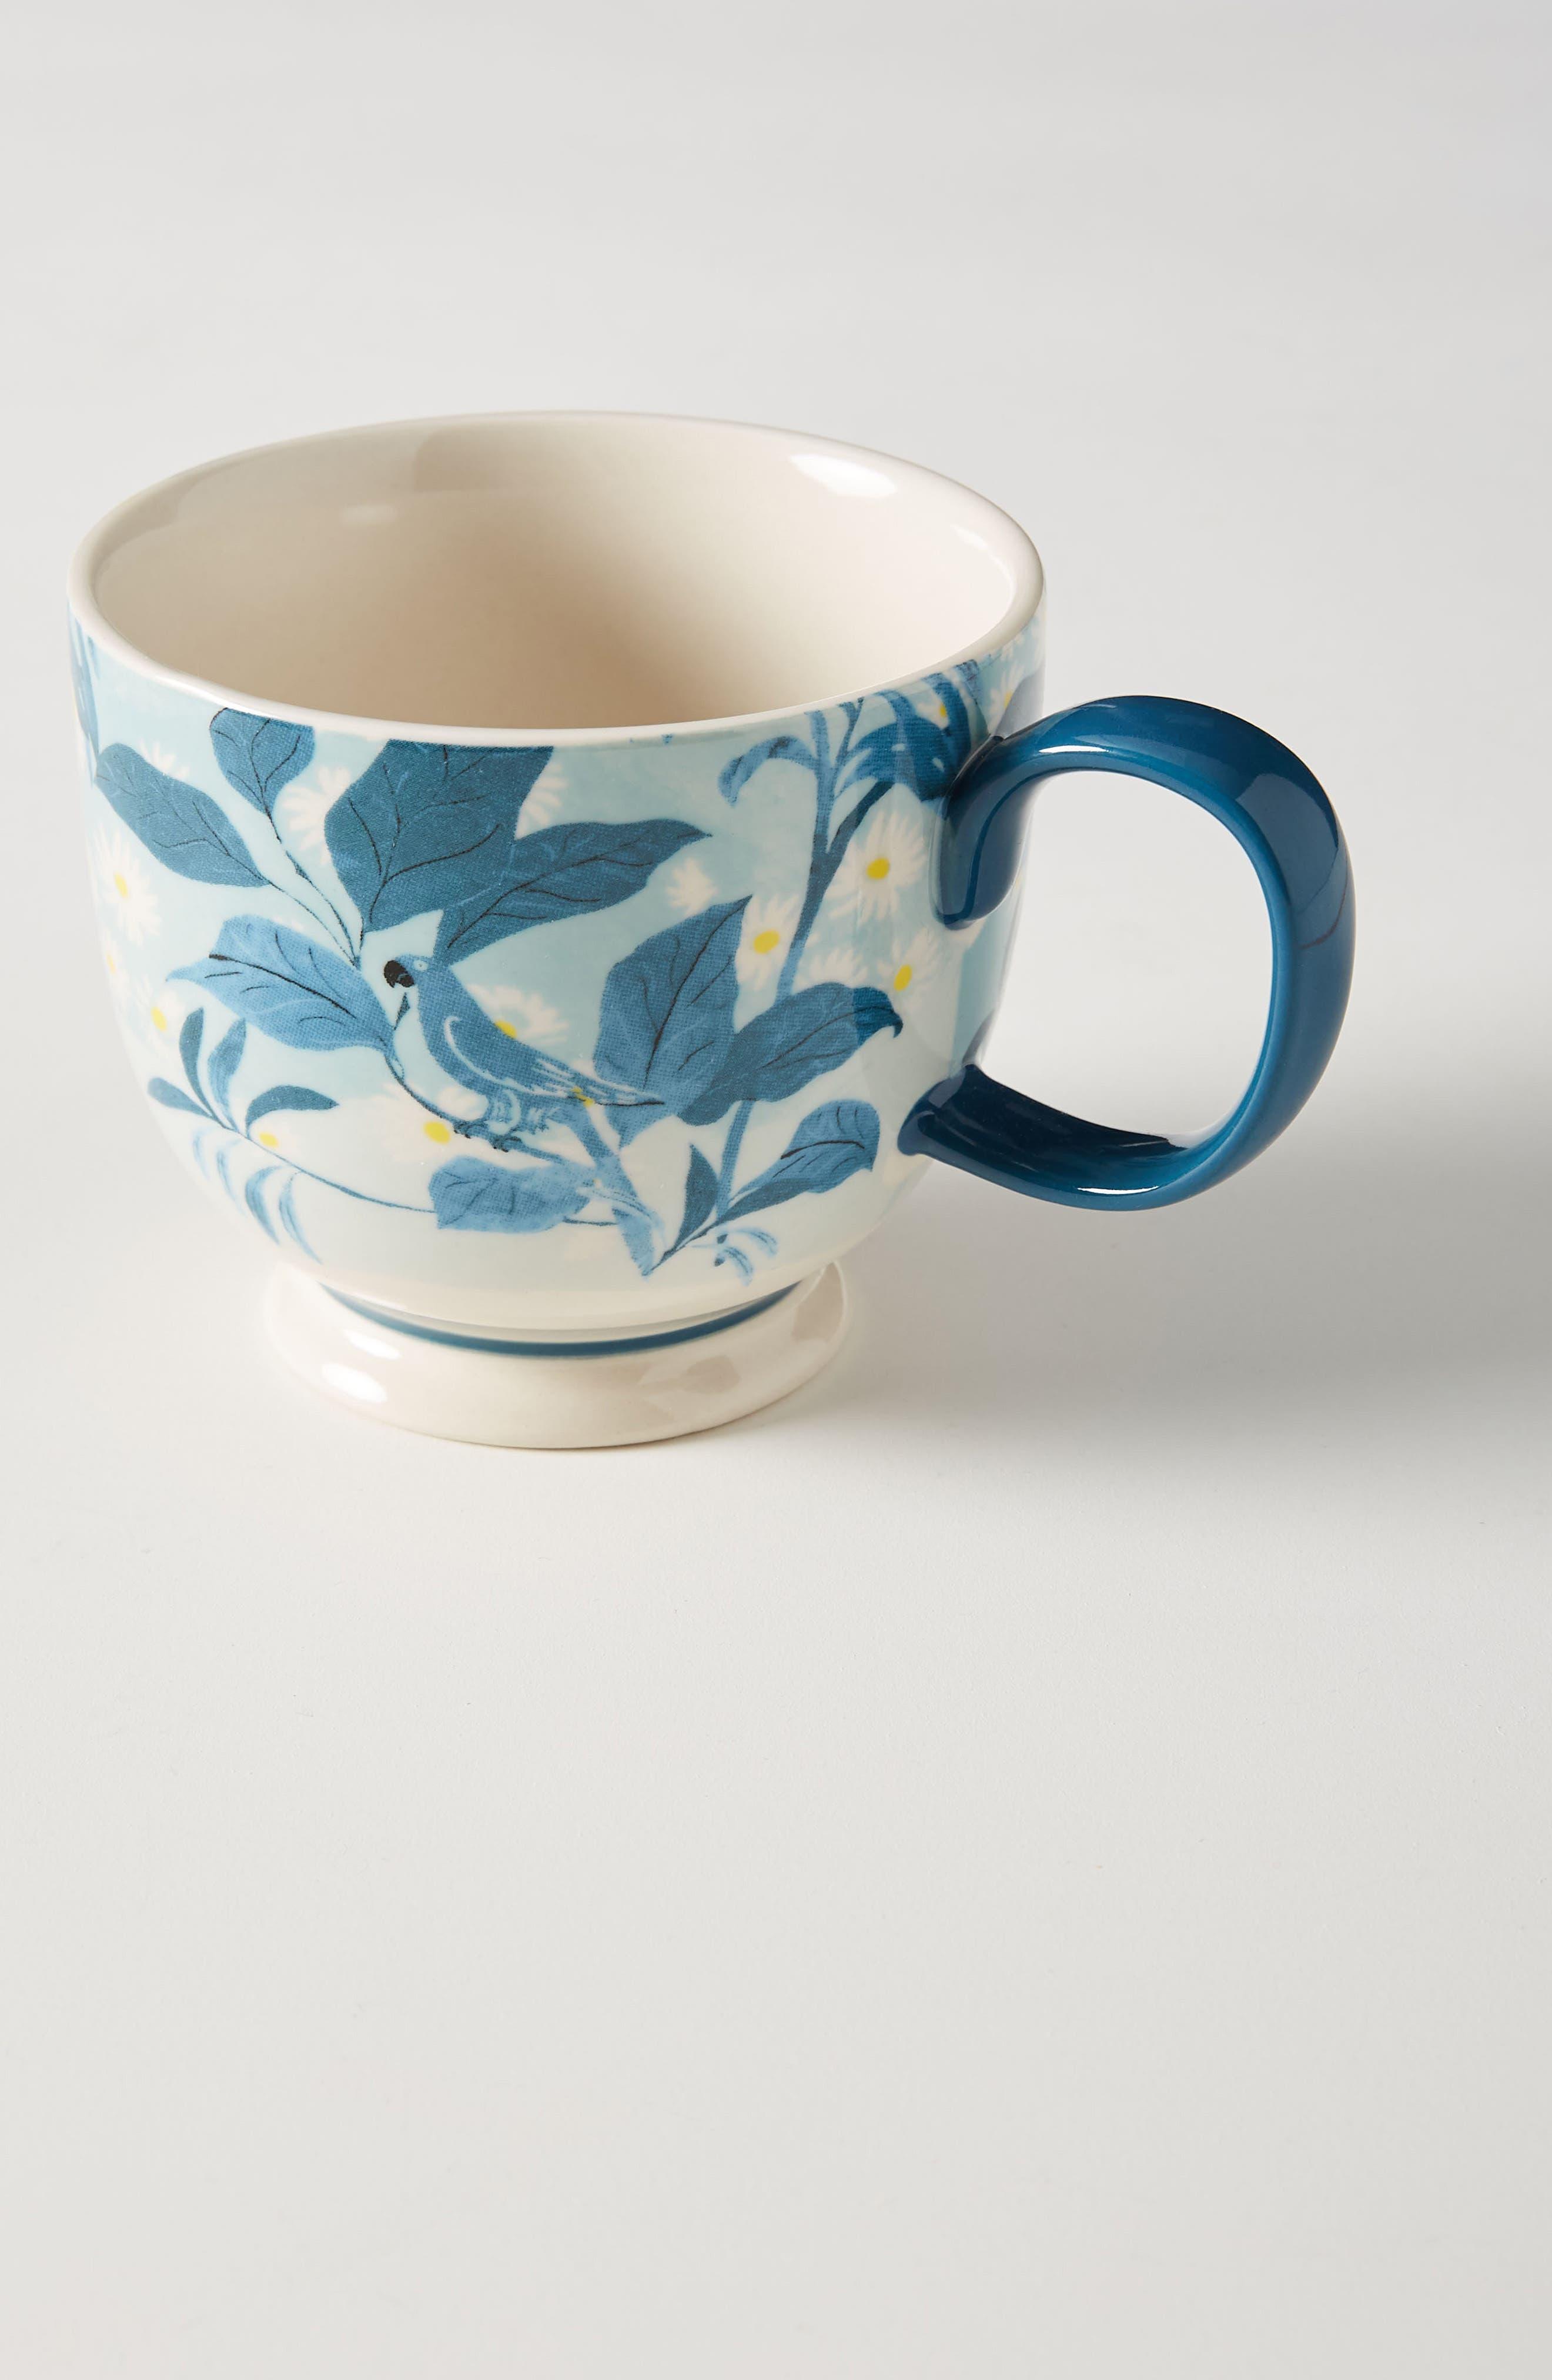 ANTHROPOLOGIE, Paule Marrot Set of 4 Mugs, Main thumbnail 1, color, COMBO C-BLUE